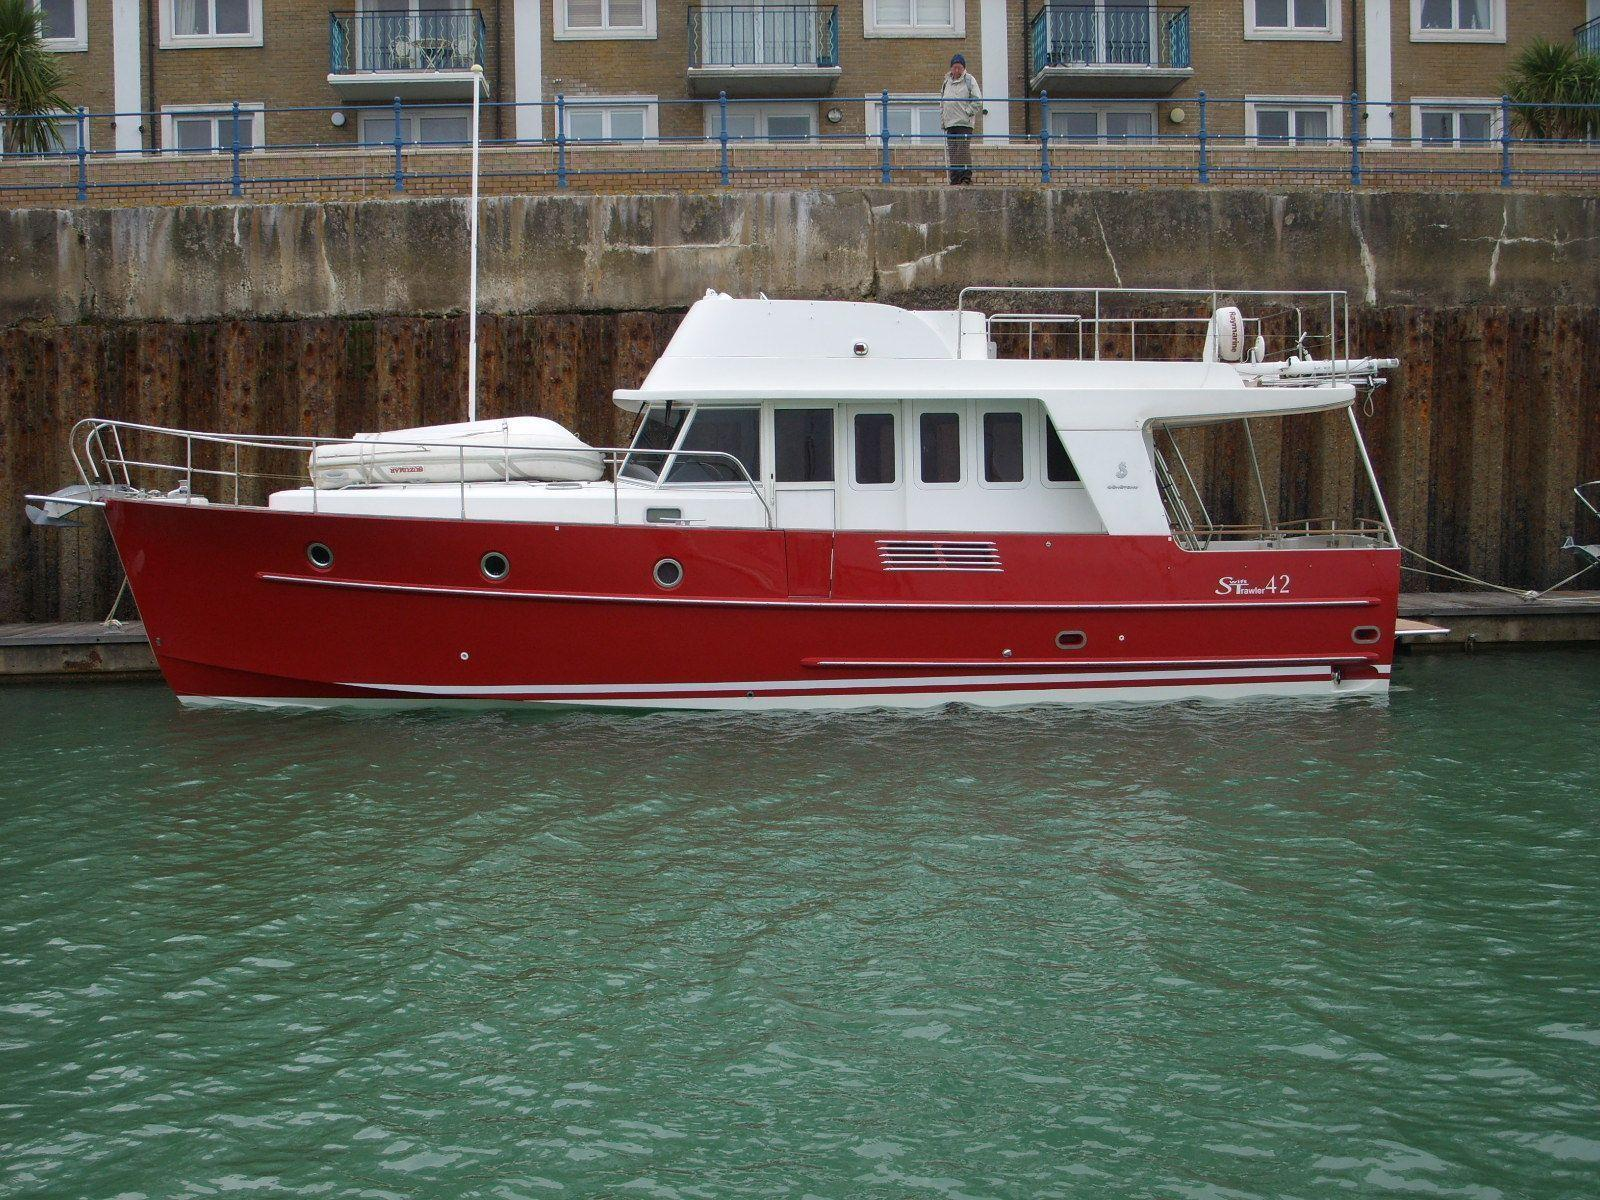 Beneteau Swift Trawler 42, Swanwick Marina, Hampshire